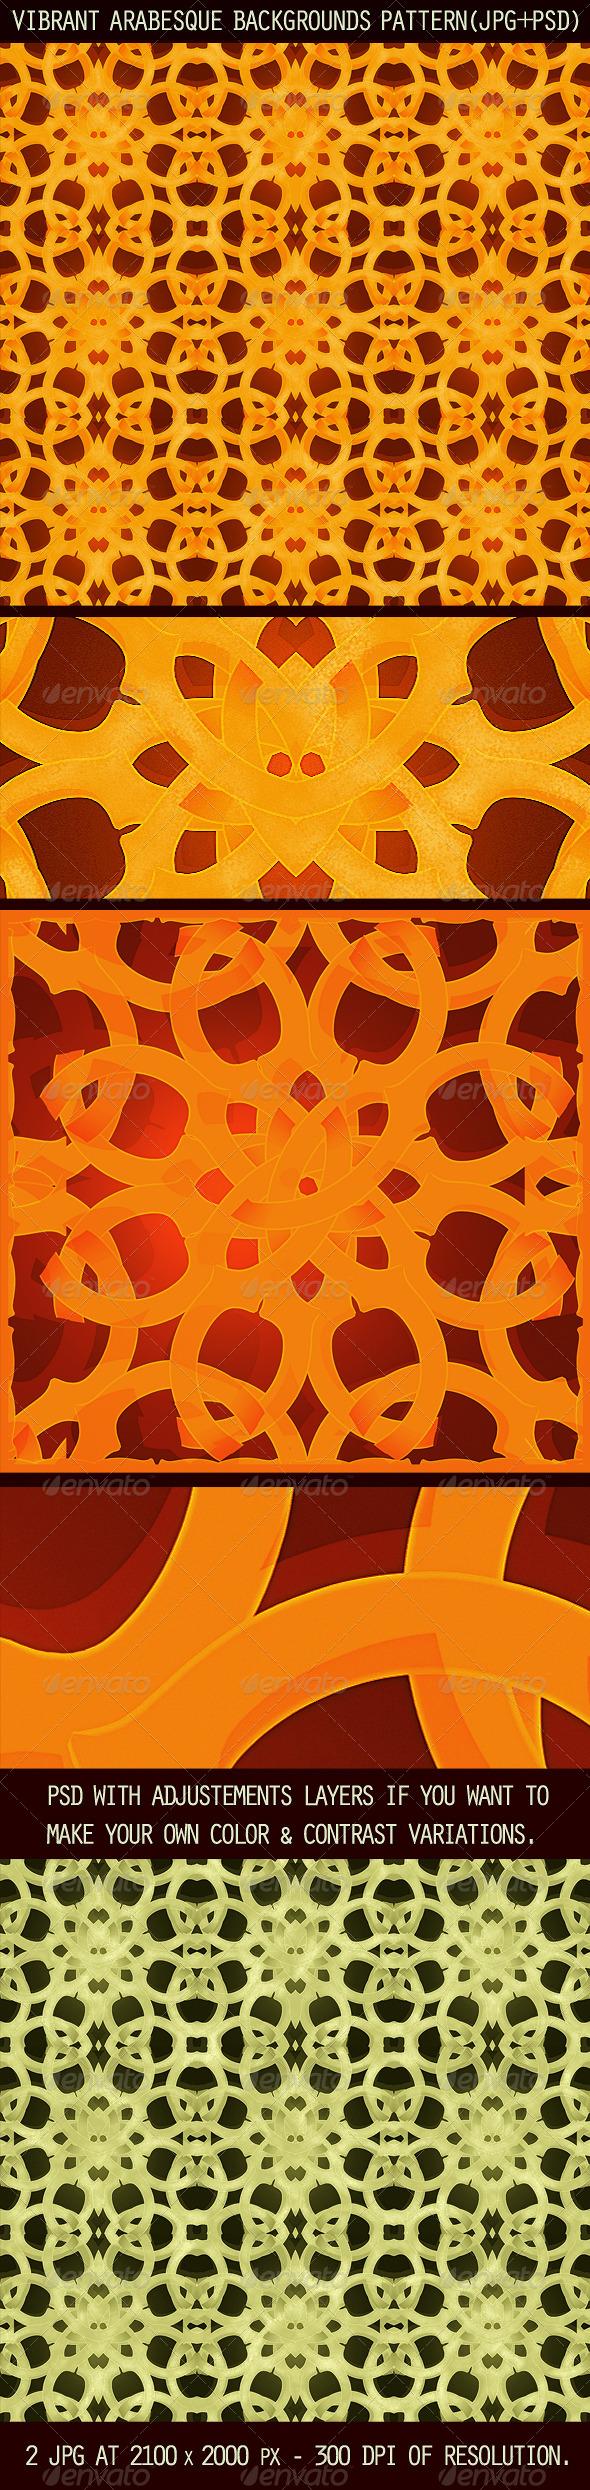 GraphicRiver 2 Vibrant Arabesque Background Patterns 4367117